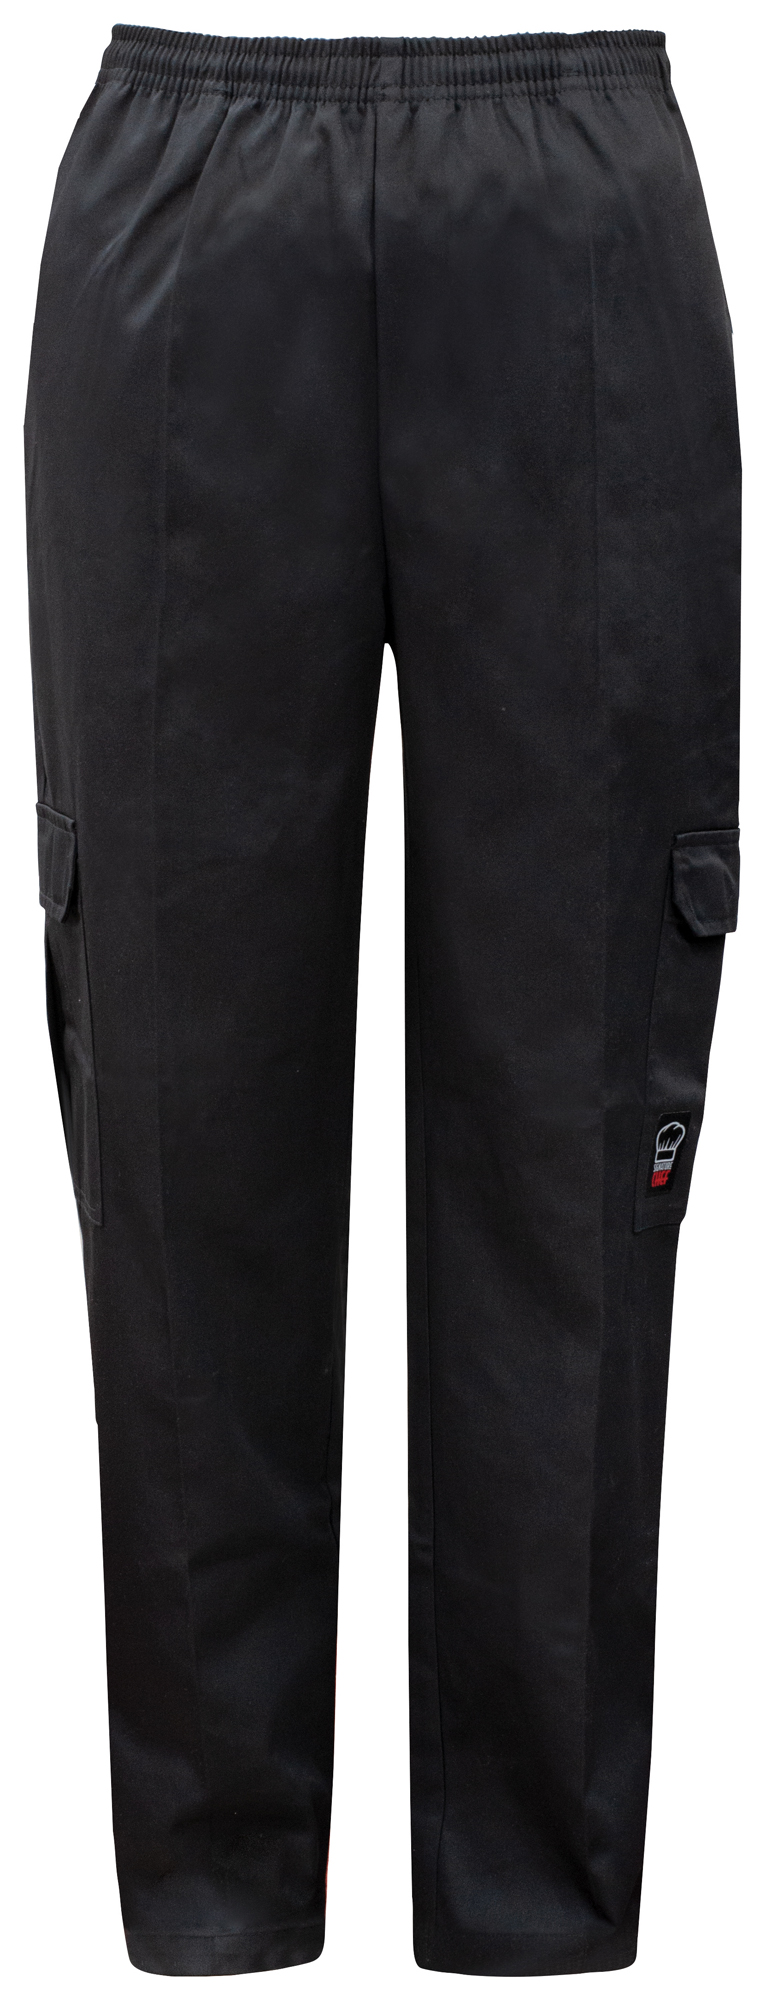 Winco UNF-11KS cargo chef pants